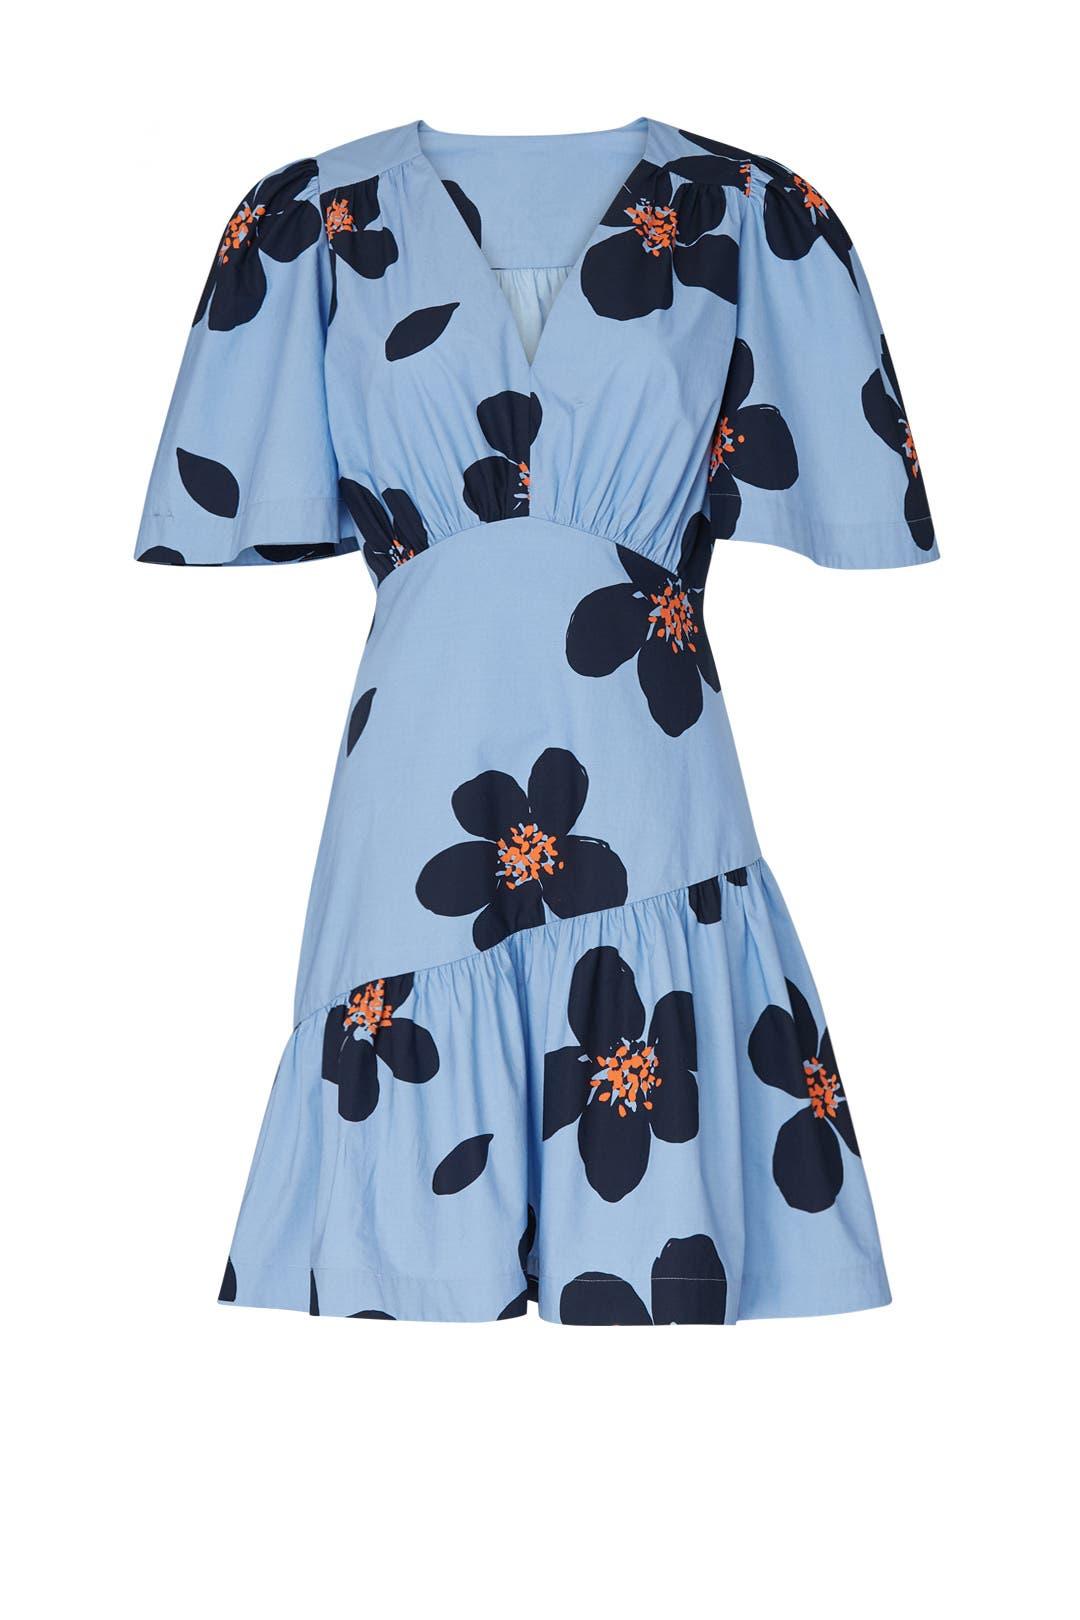 09b40c1ae61 kate spade new york. Read Reviews. Grand Flora Dress